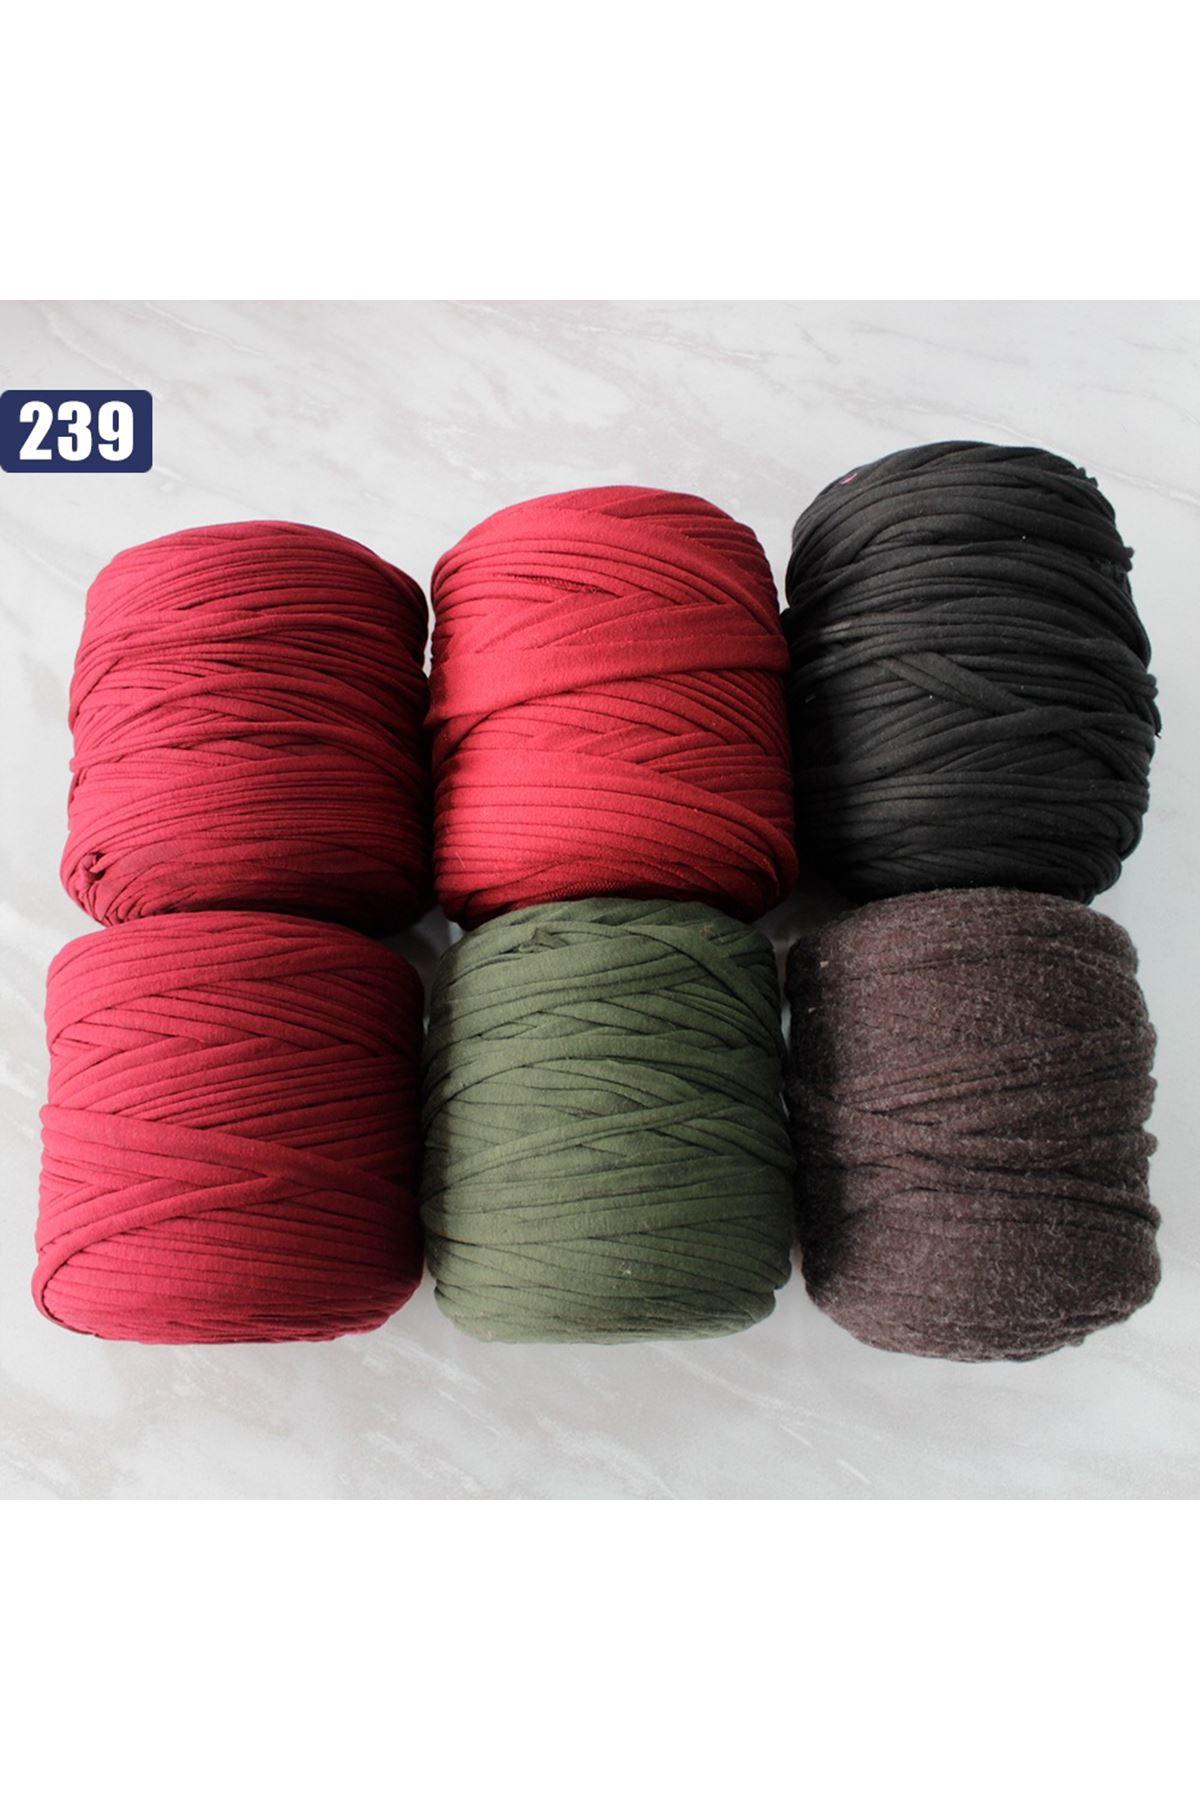 Penye 6'lı Grup 239